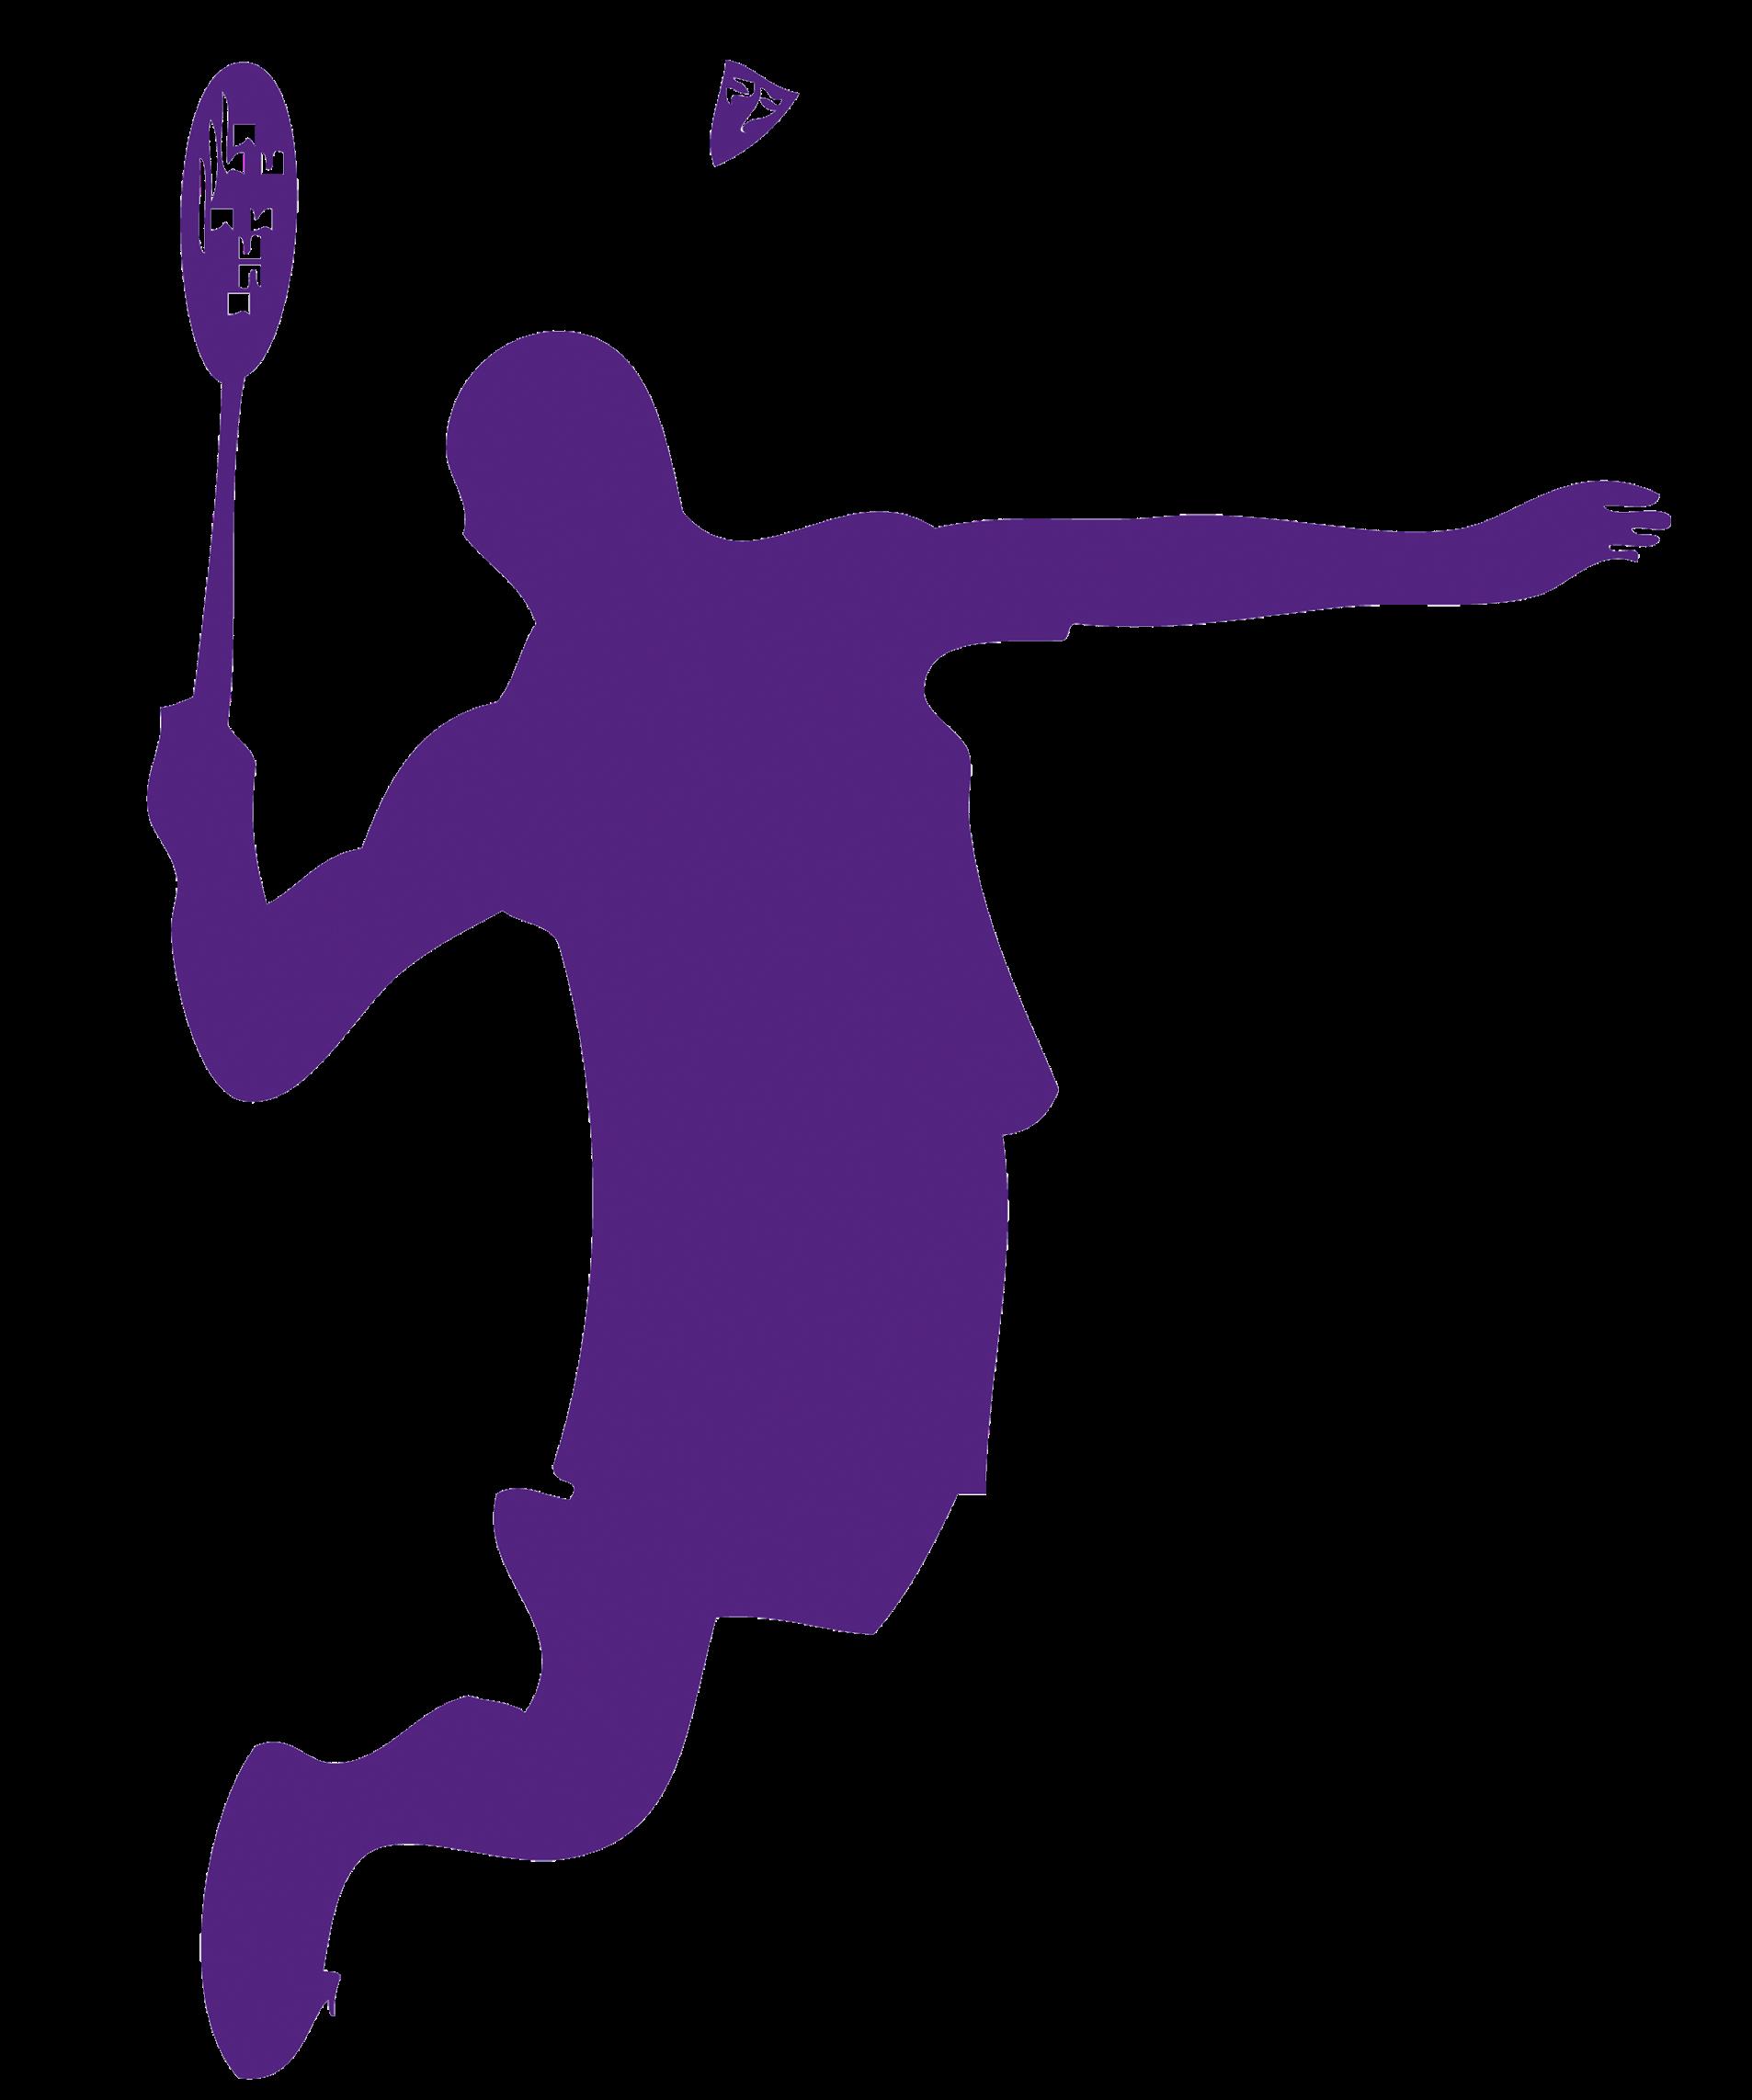 Badminton Free Download Png PNG Image